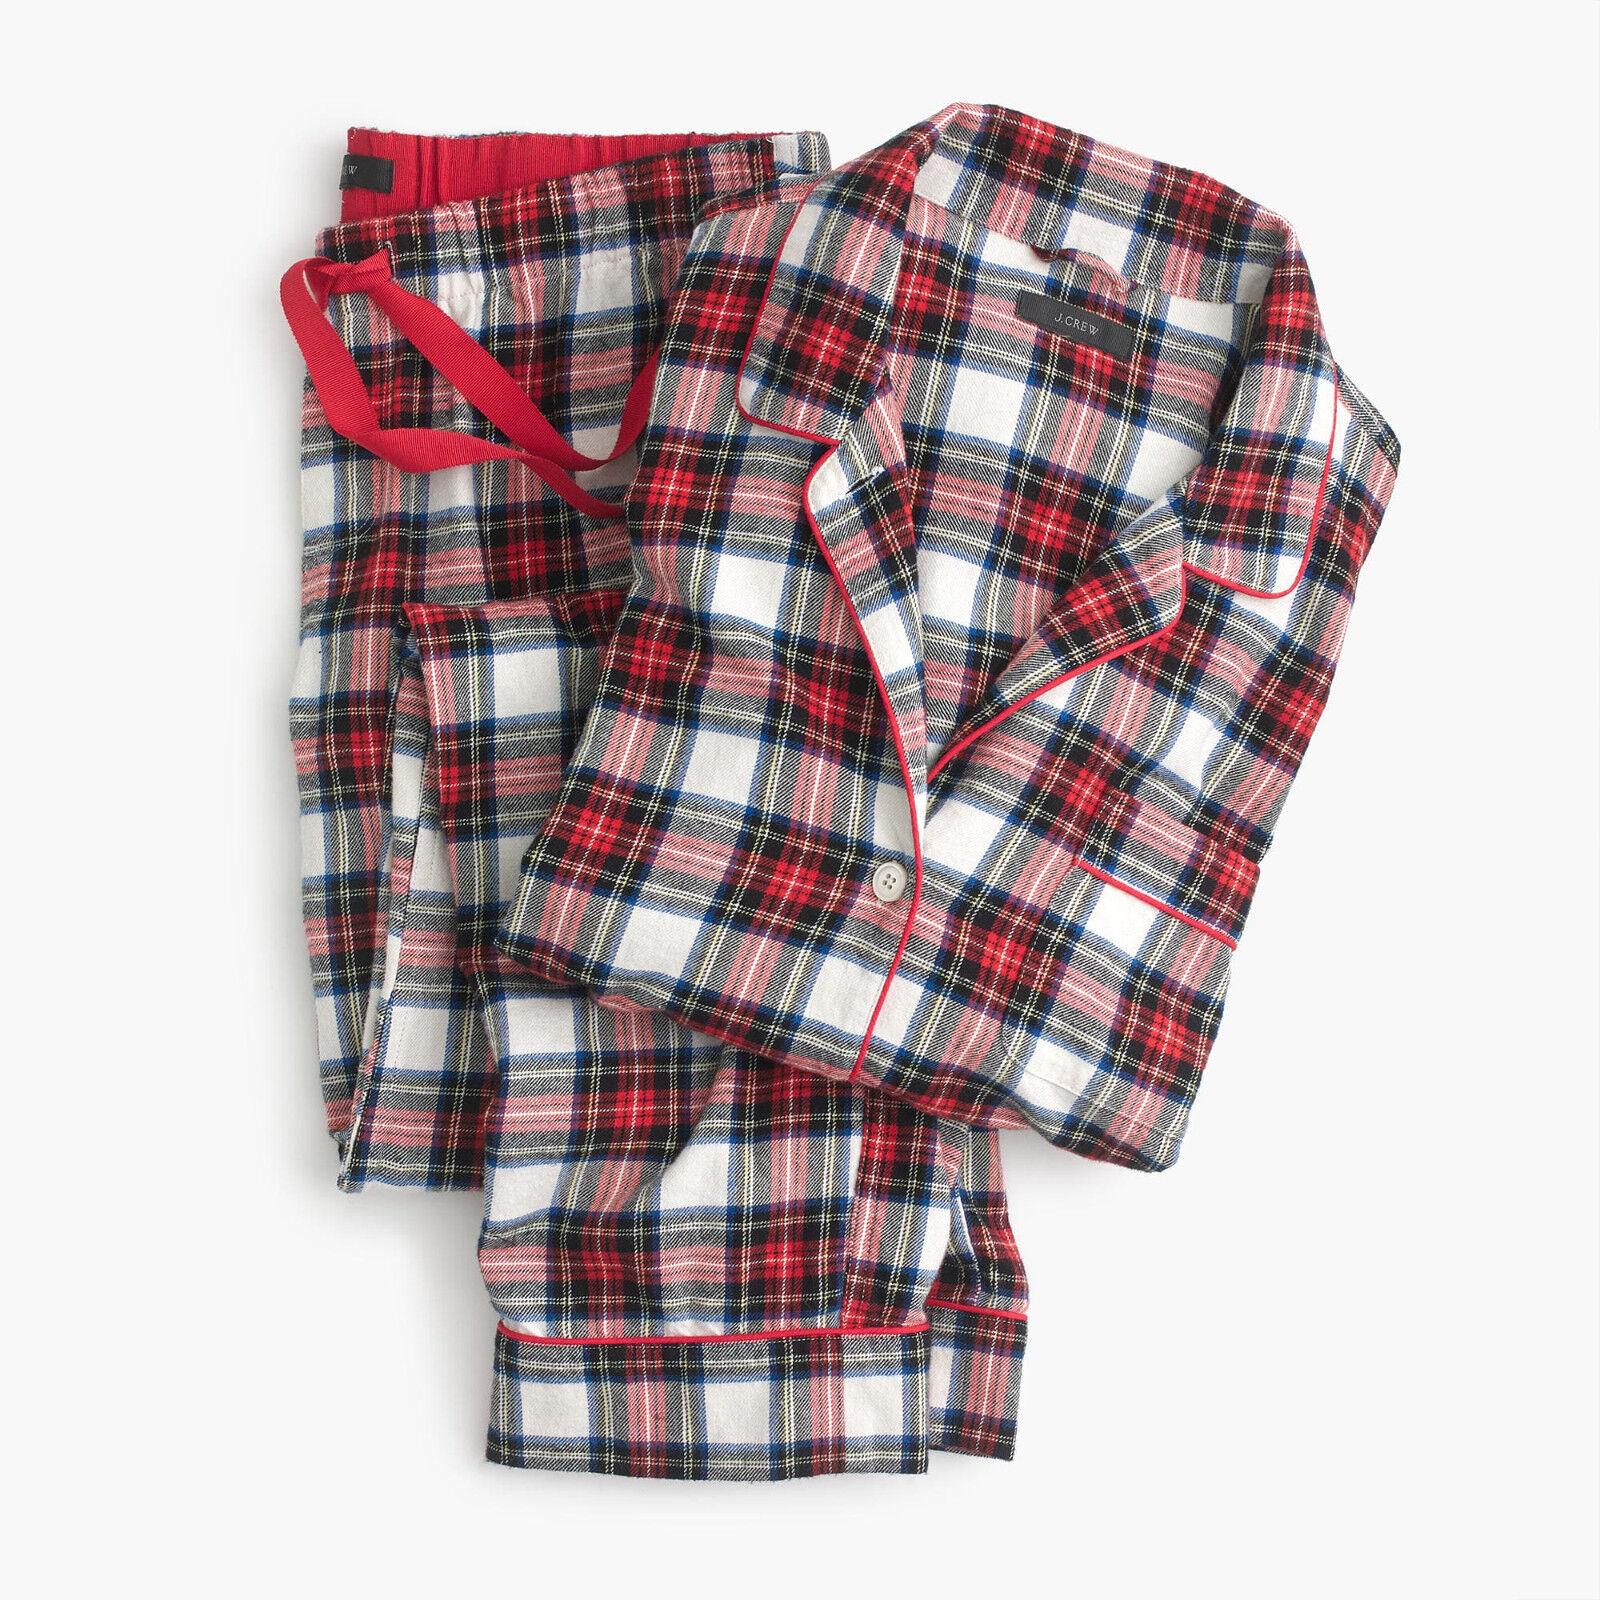 NWT J CREW KVINNOR Flannell pyjamas Sett i Tkonstan Plaid Röda flottans storlek liten